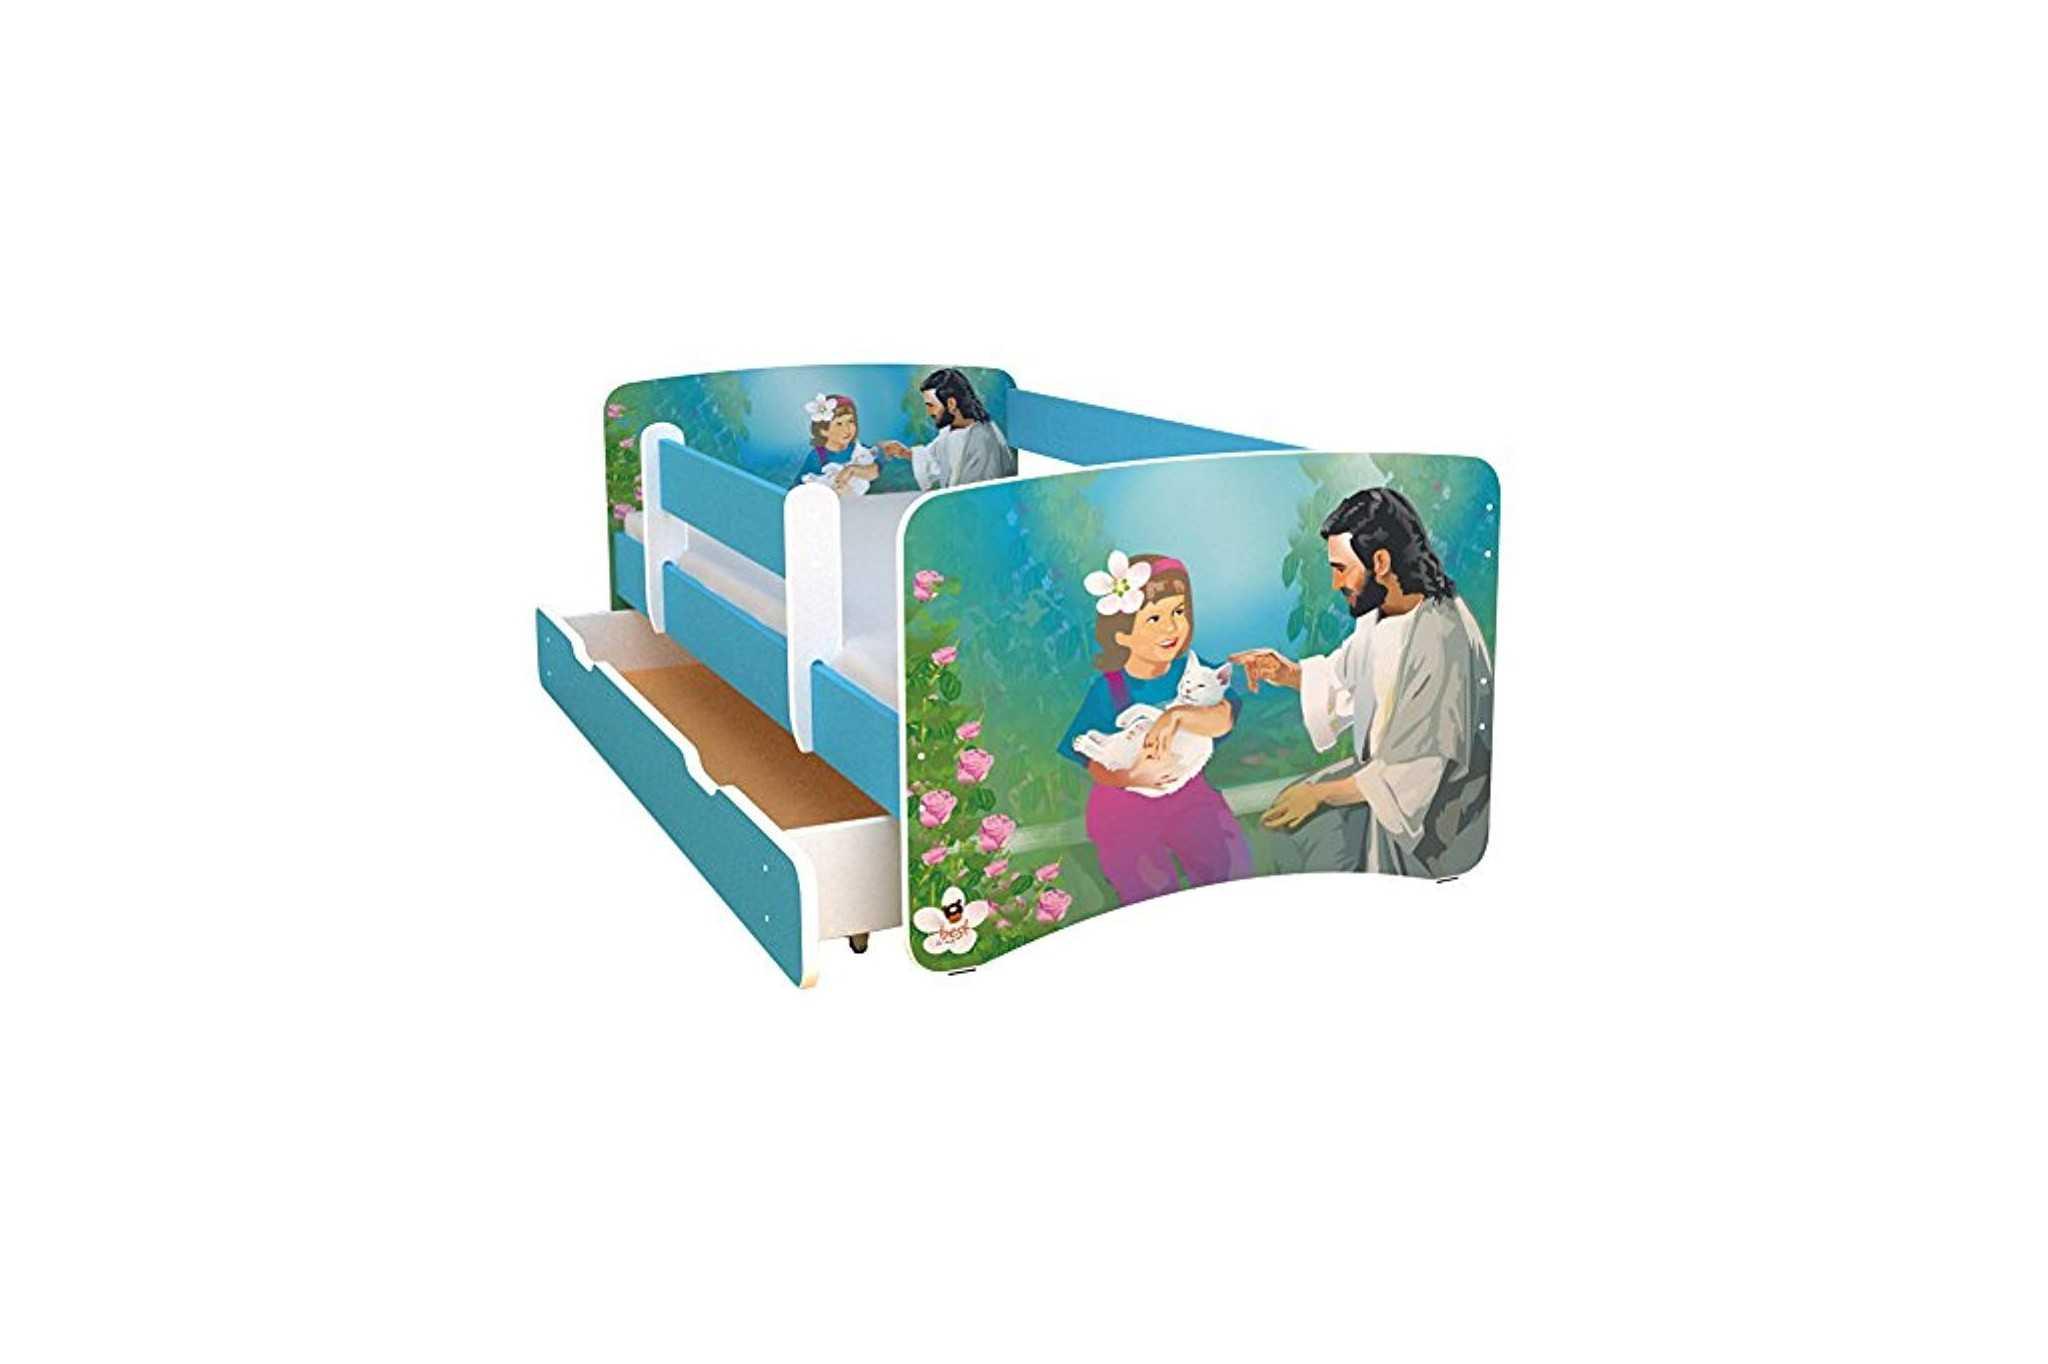 best for kids kinderbett 80x160 mit rausfallschutz bunte. Black Bedroom Furniture Sets. Home Design Ideas